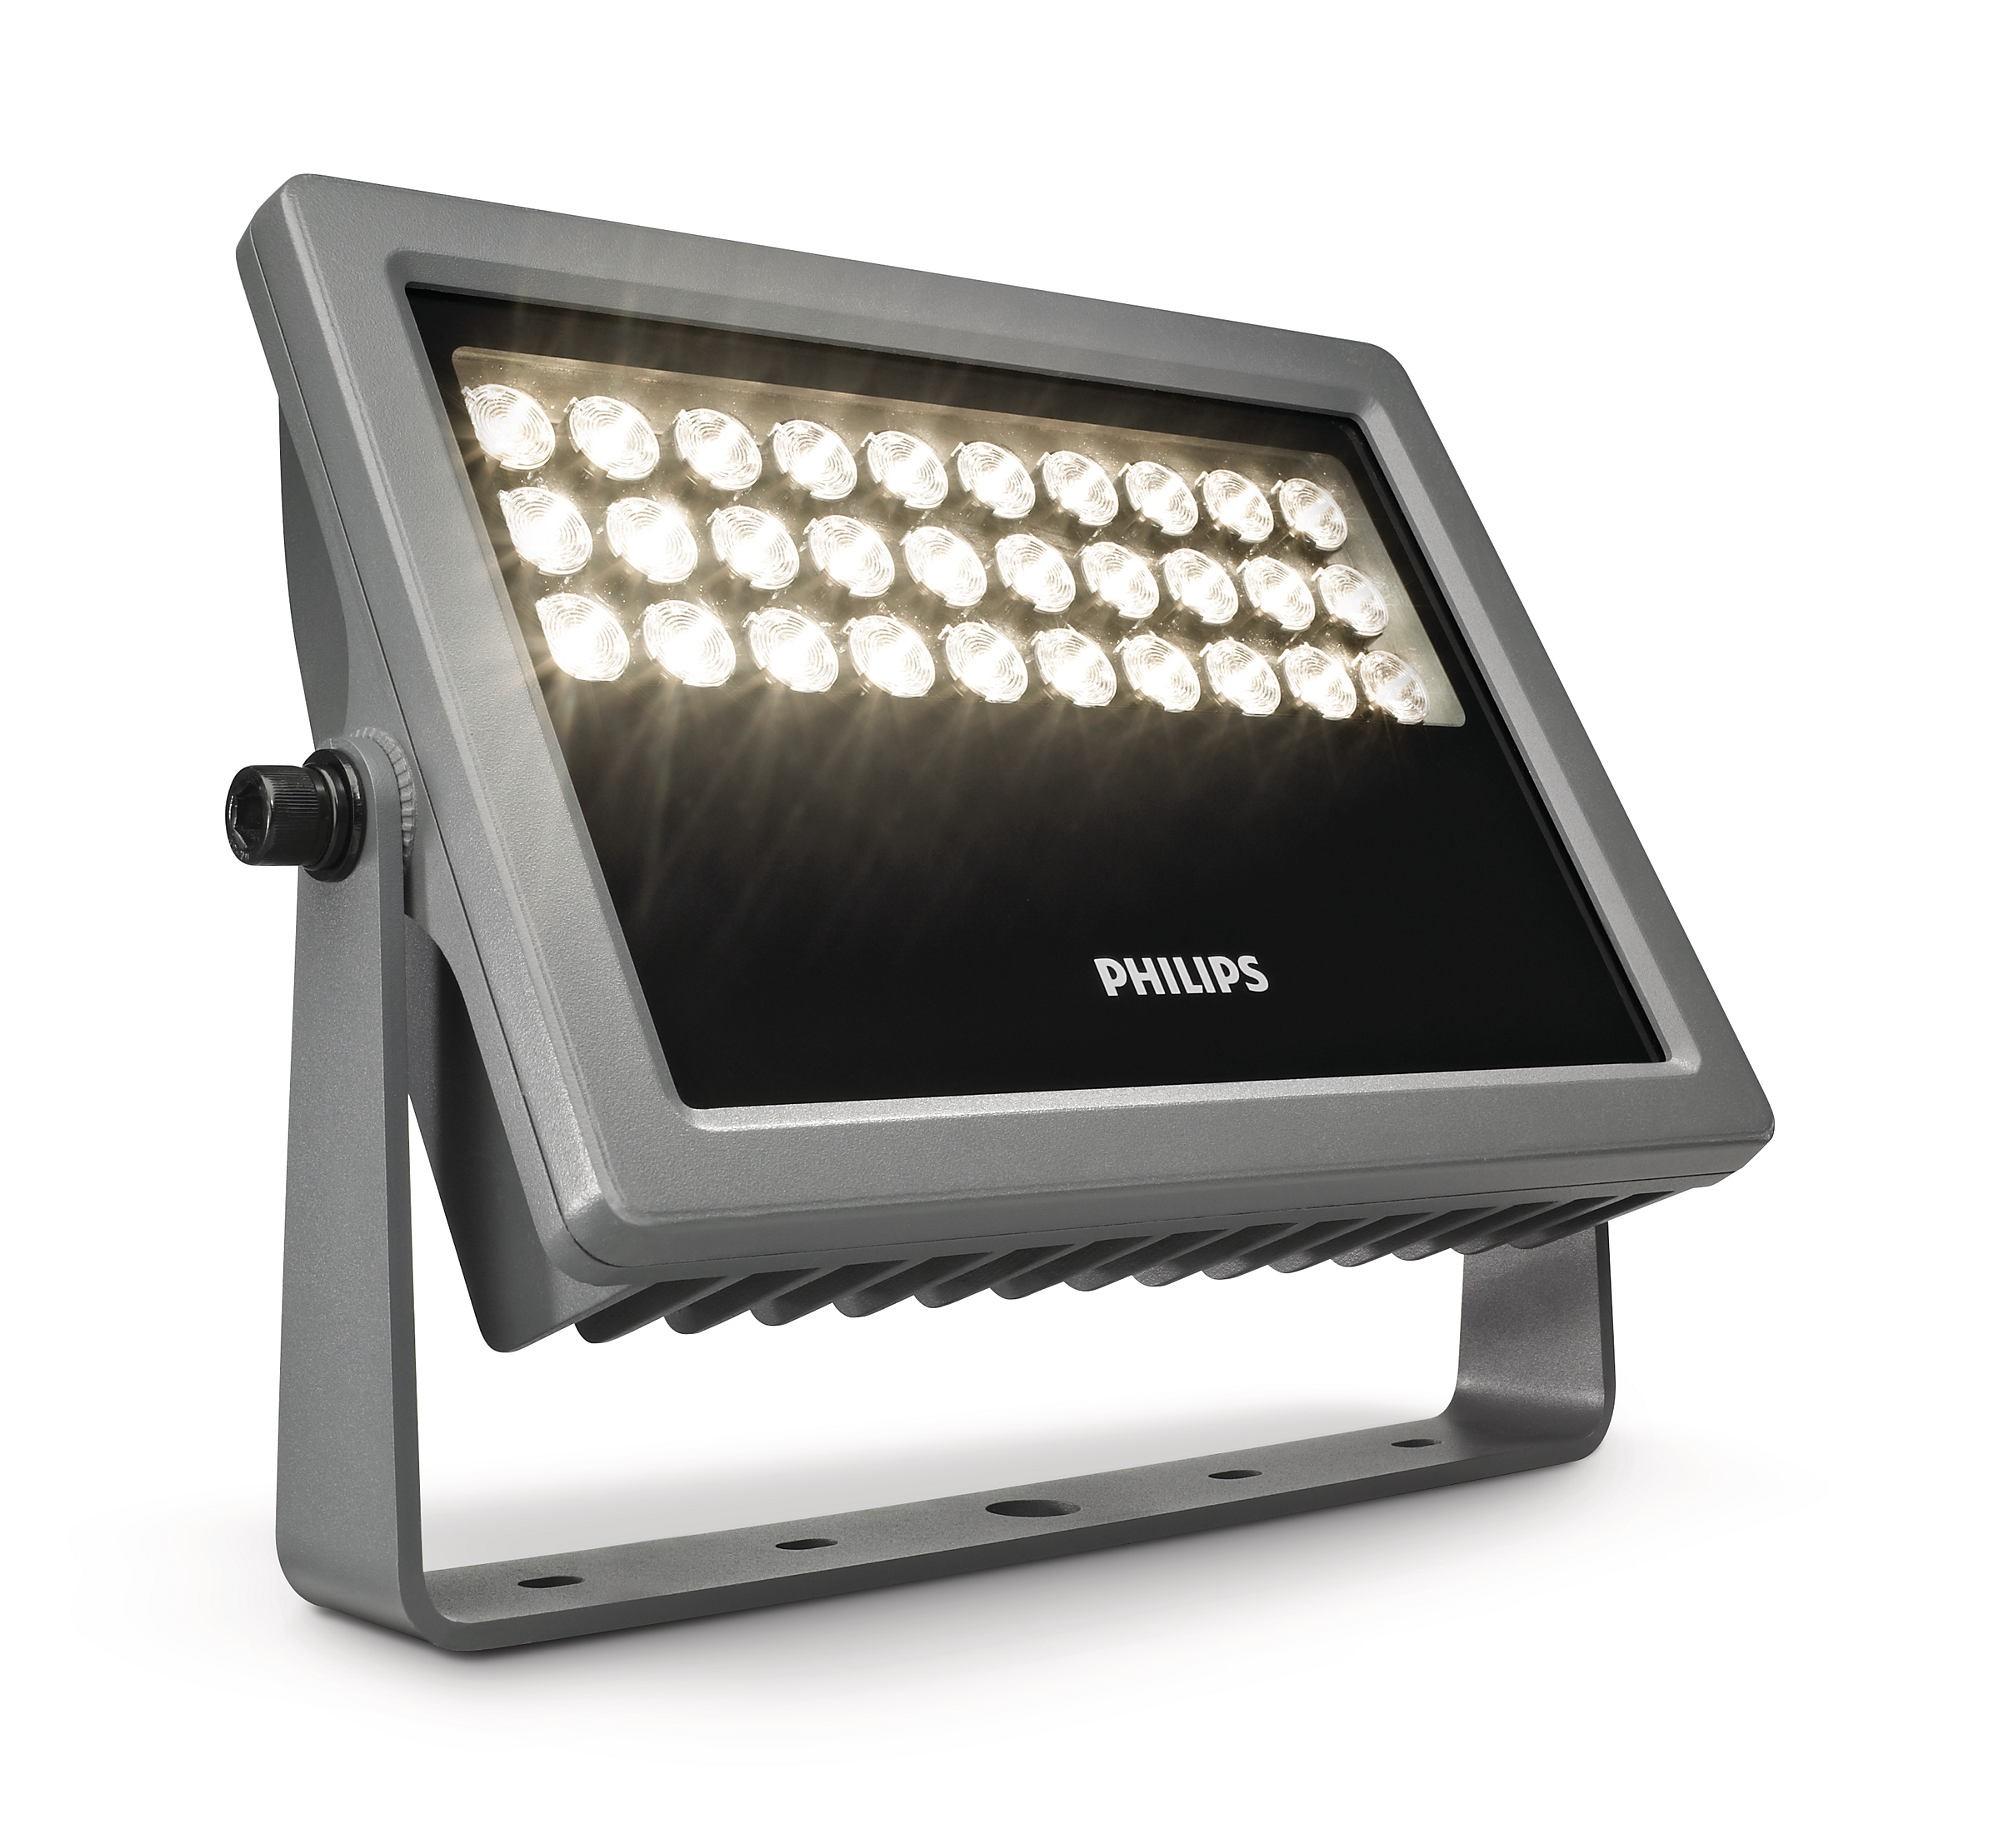 27 Awesome Philips Led Flood Lights Pixelmari Com